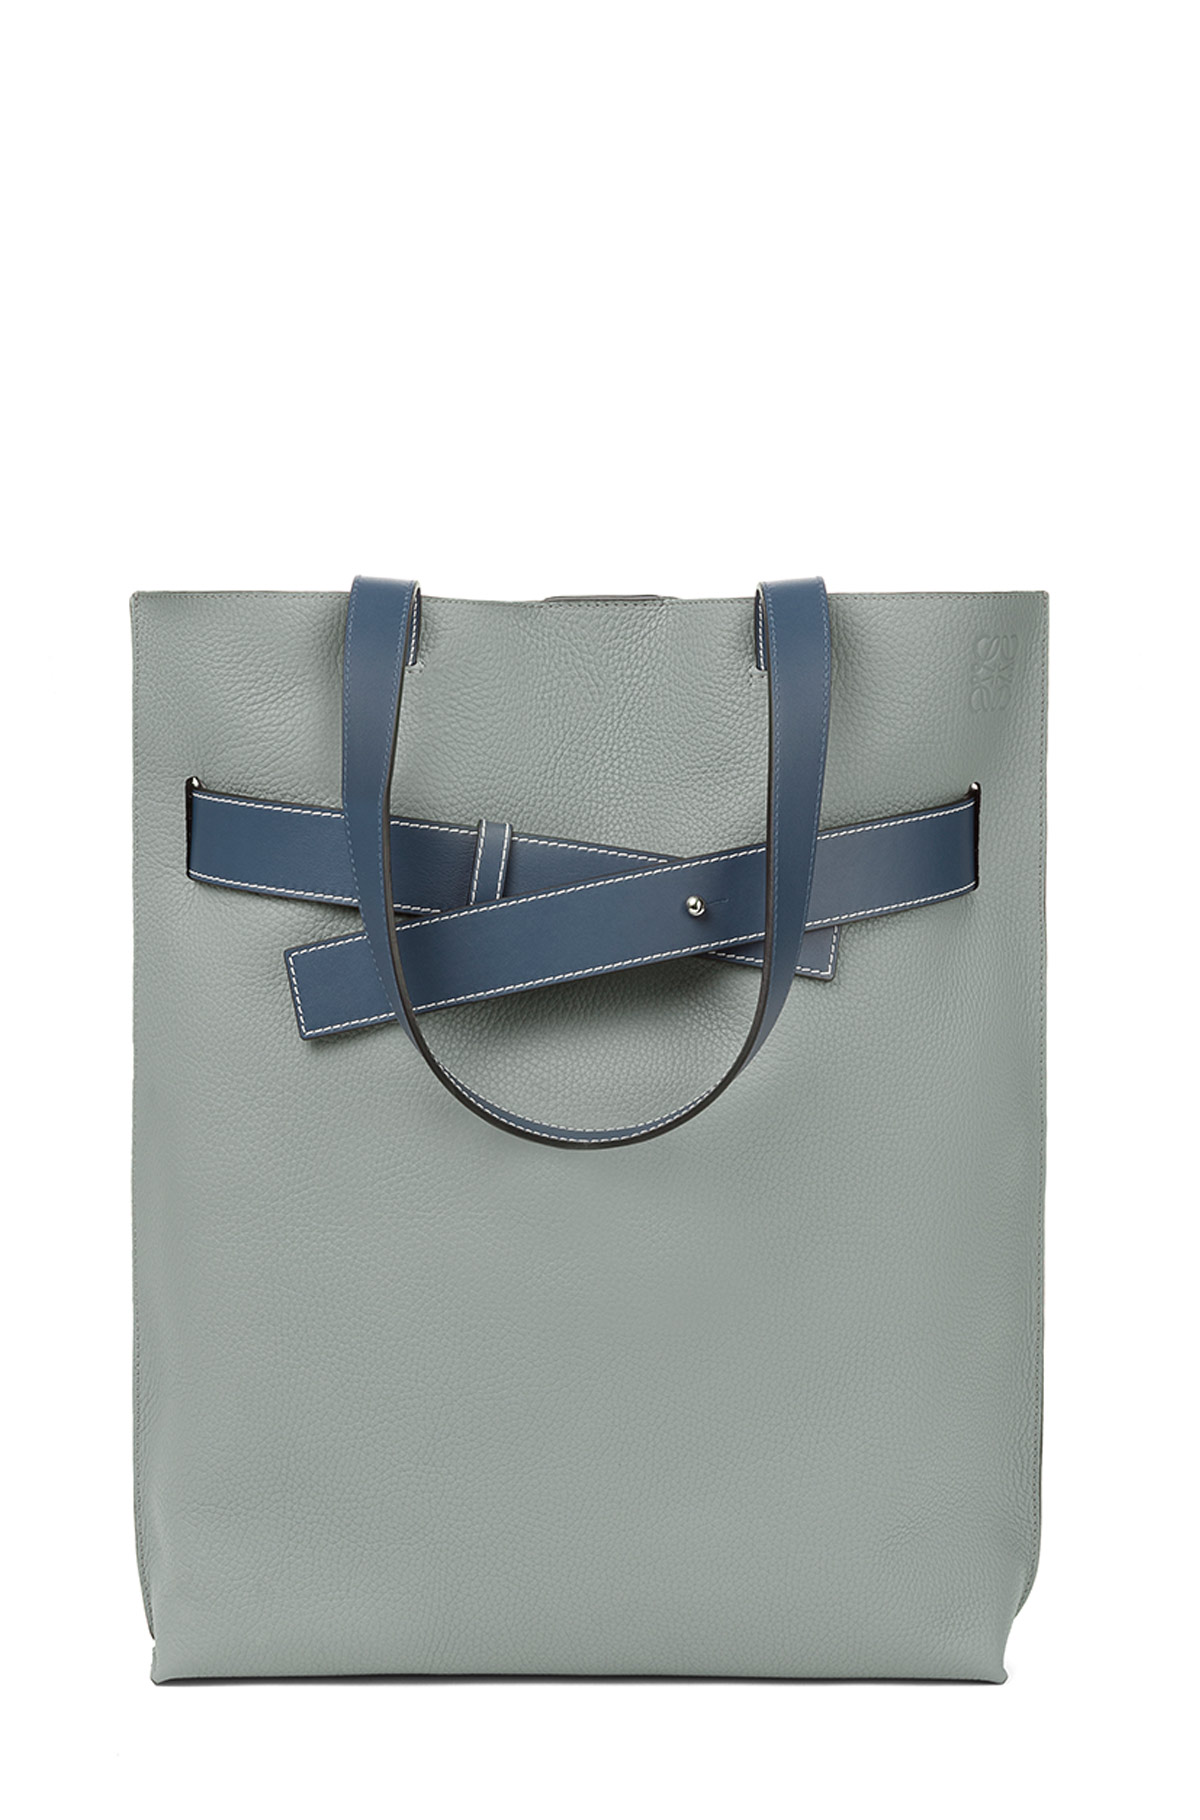 LOEWE Strap Vertical Tote Bag Cloud/Indigo front